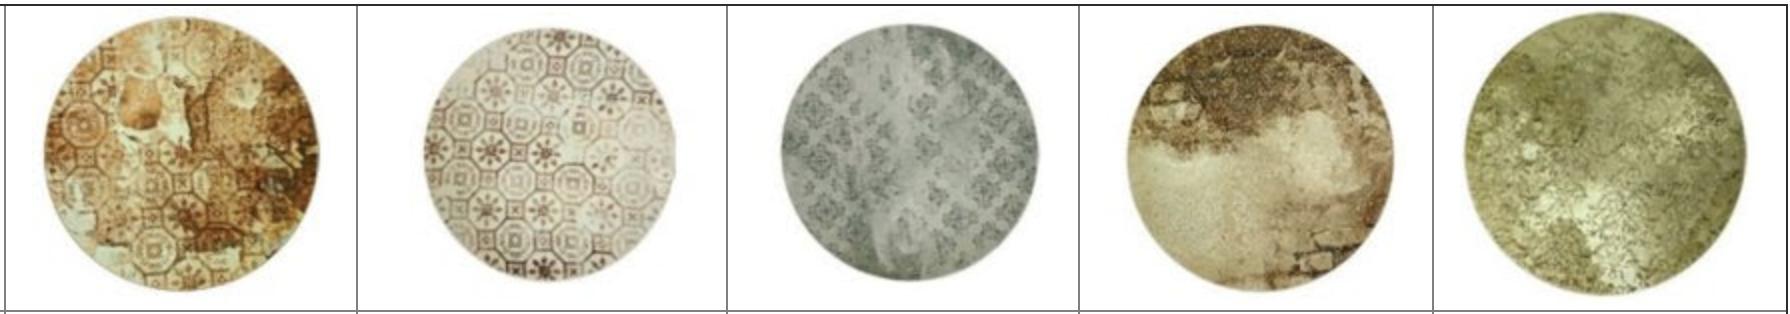 Bauscher Vintage Tiles